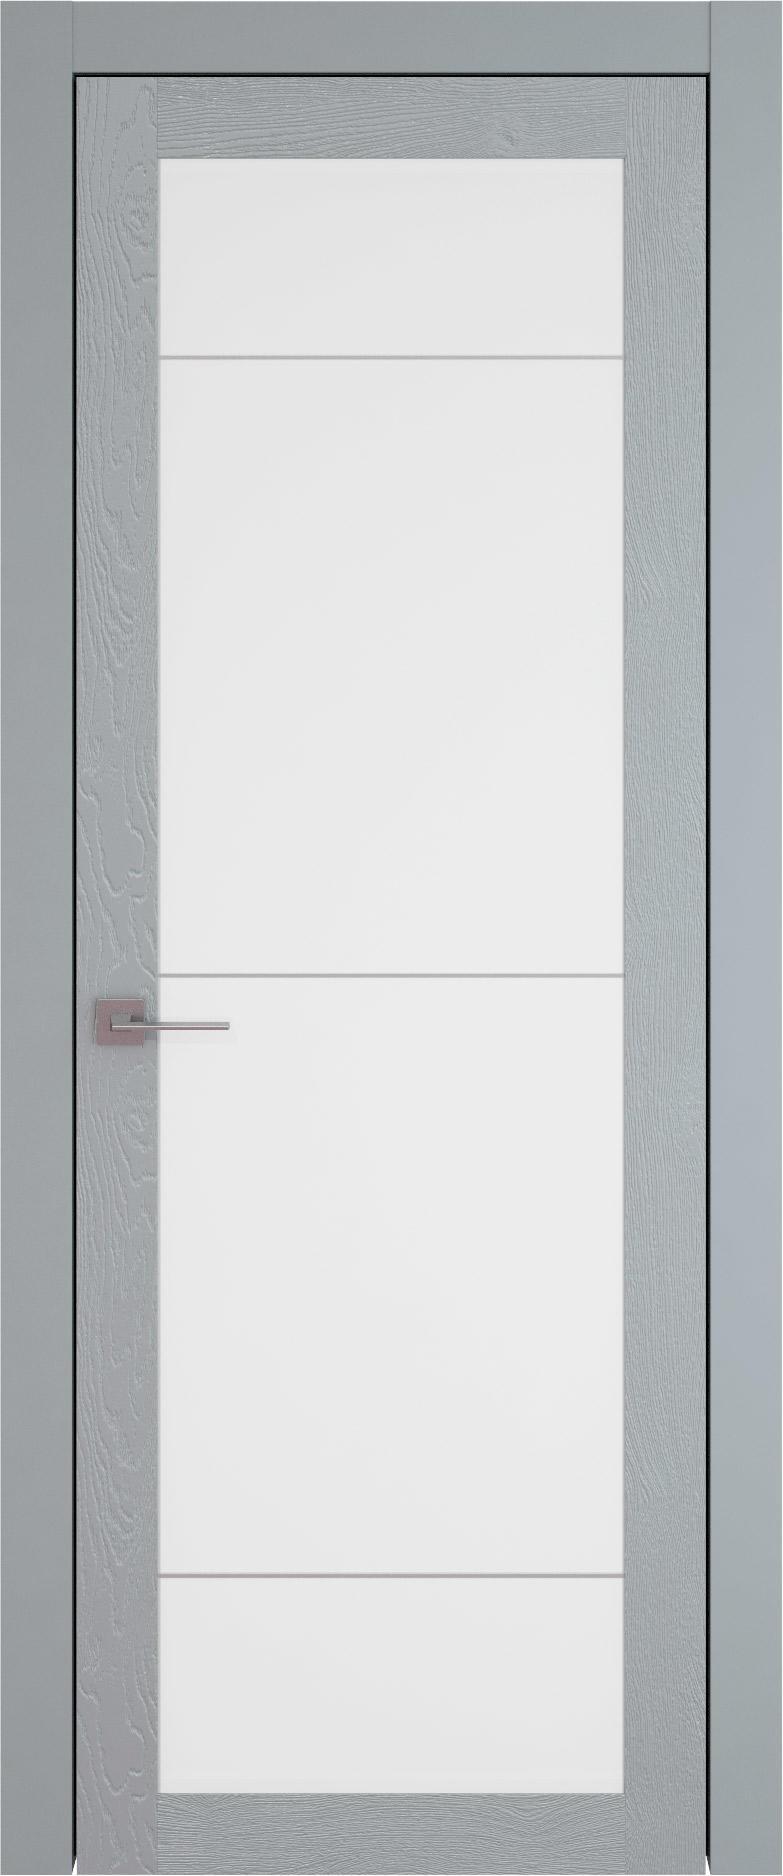 Tivoli З-3 цвет - Серебристо-серая эмаль по шпону (RAL 7045) Со стеклом (ДО)